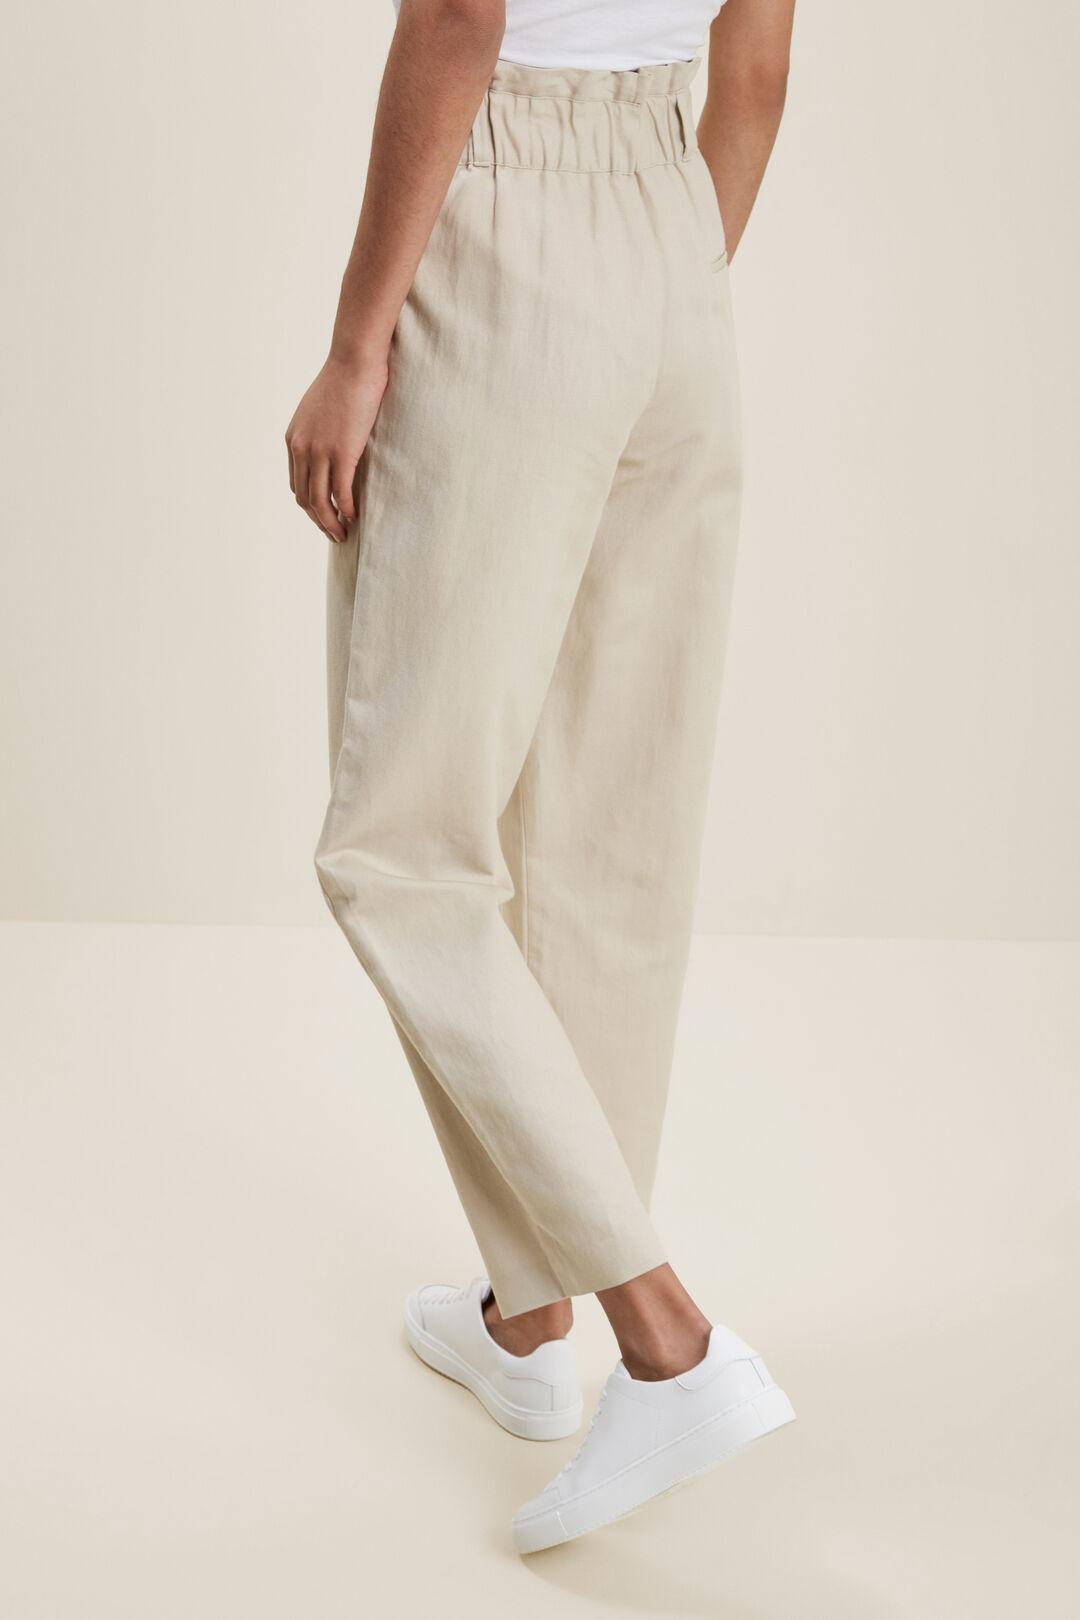 High Rise Tailored Pant  HAZEL WOOD  hi-res